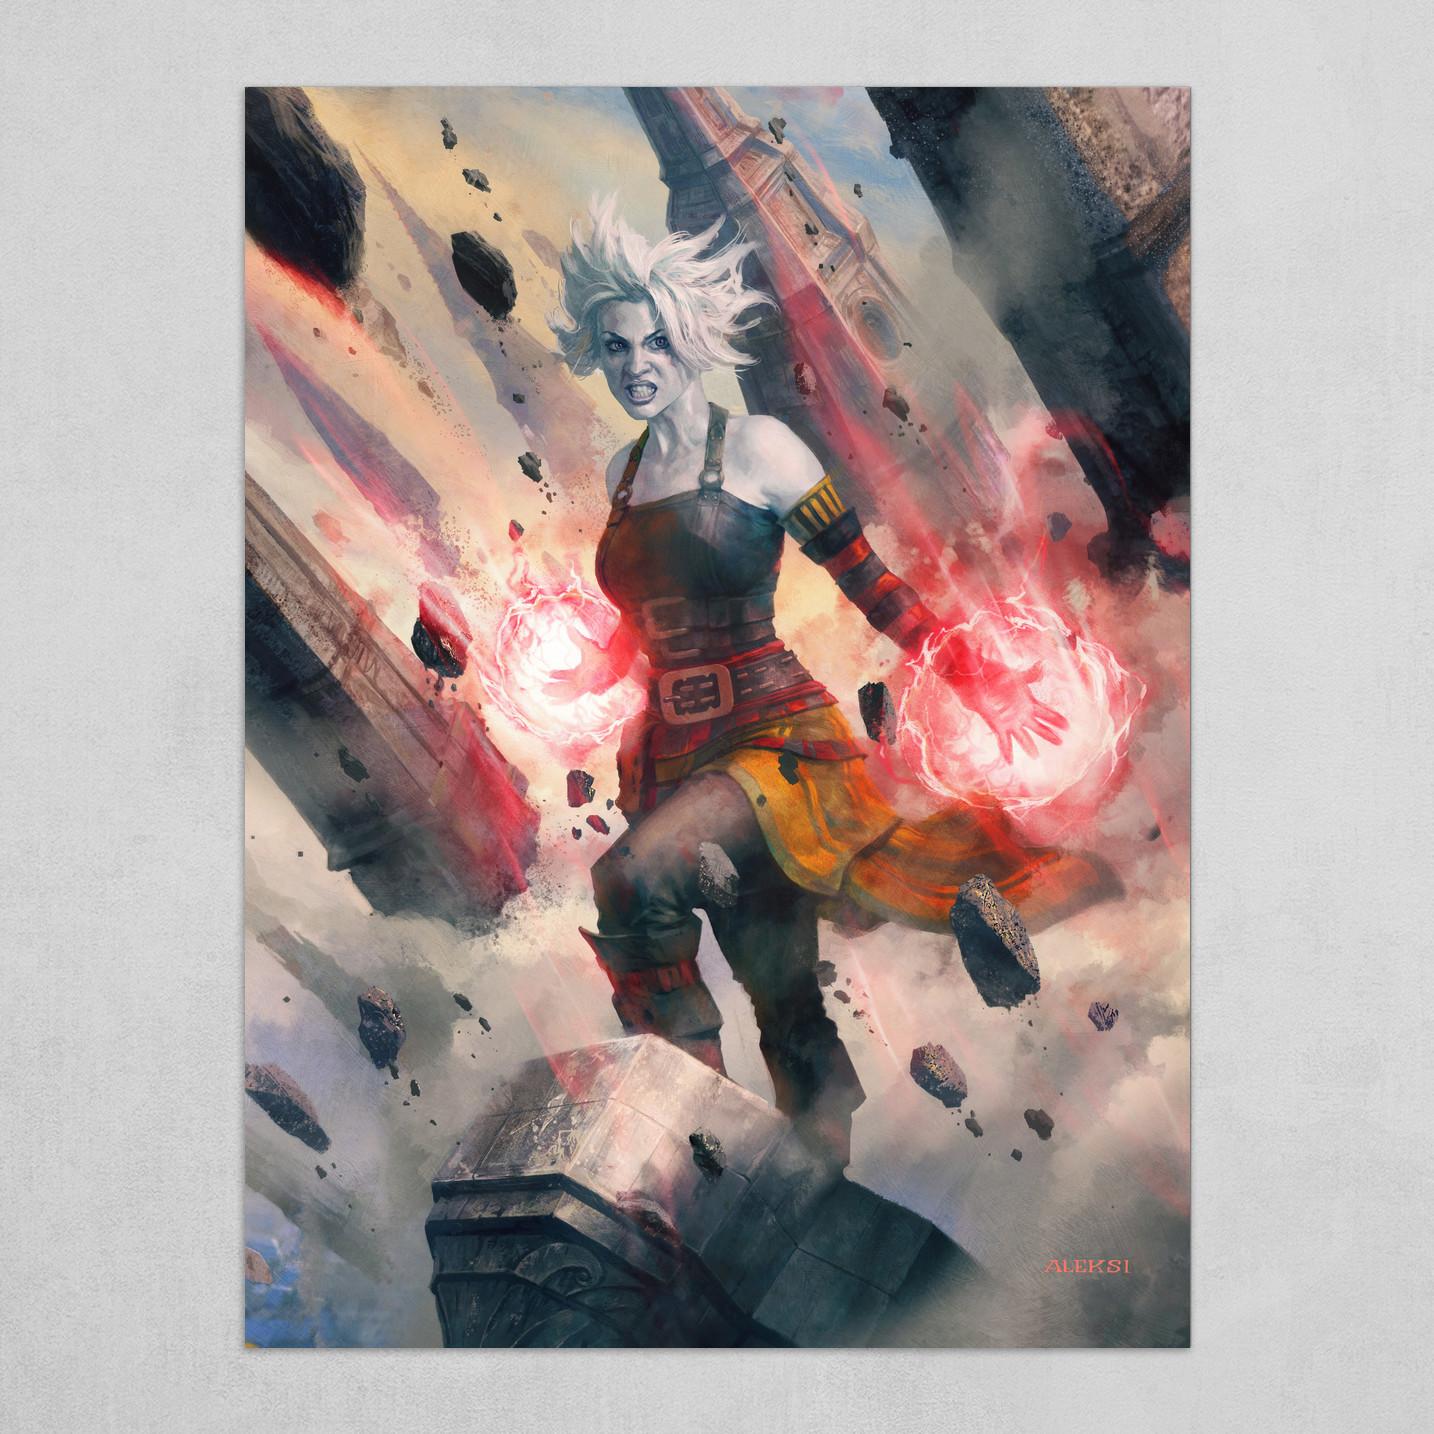 Nahiri, Rival of Stone